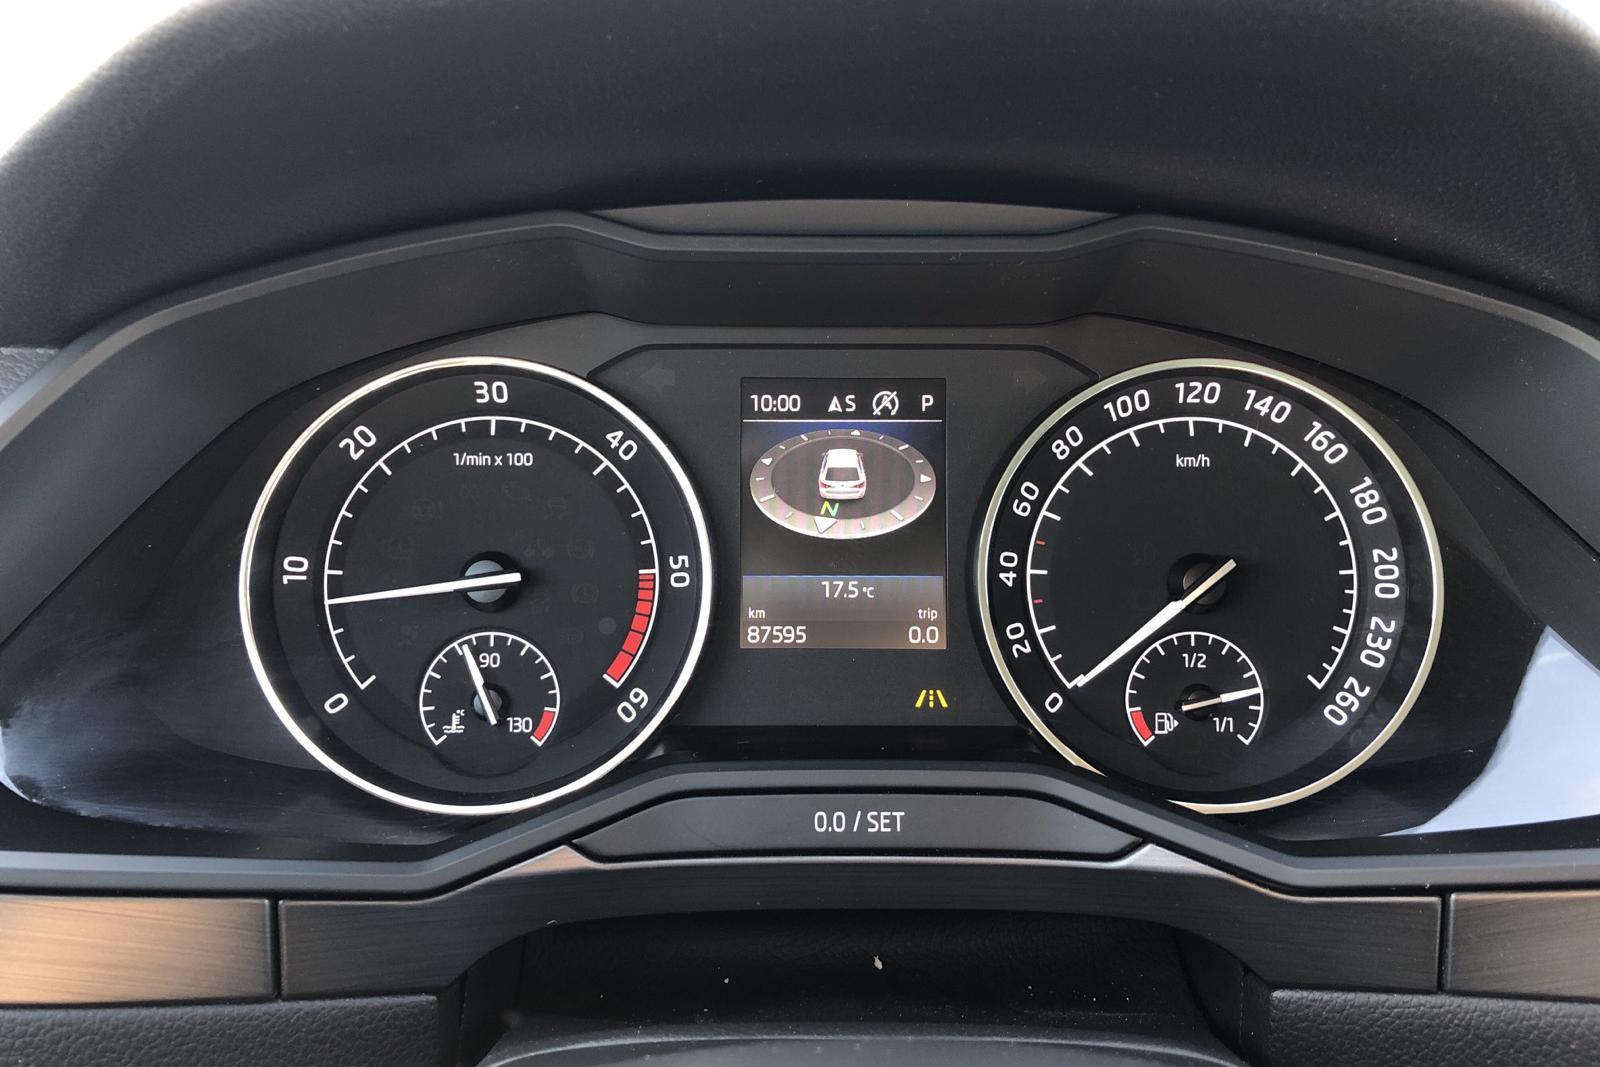 Skoda Superb 2.0 TDI 4x4 Kombi (190hk) - 87 590 km - Automatic - white - 2018